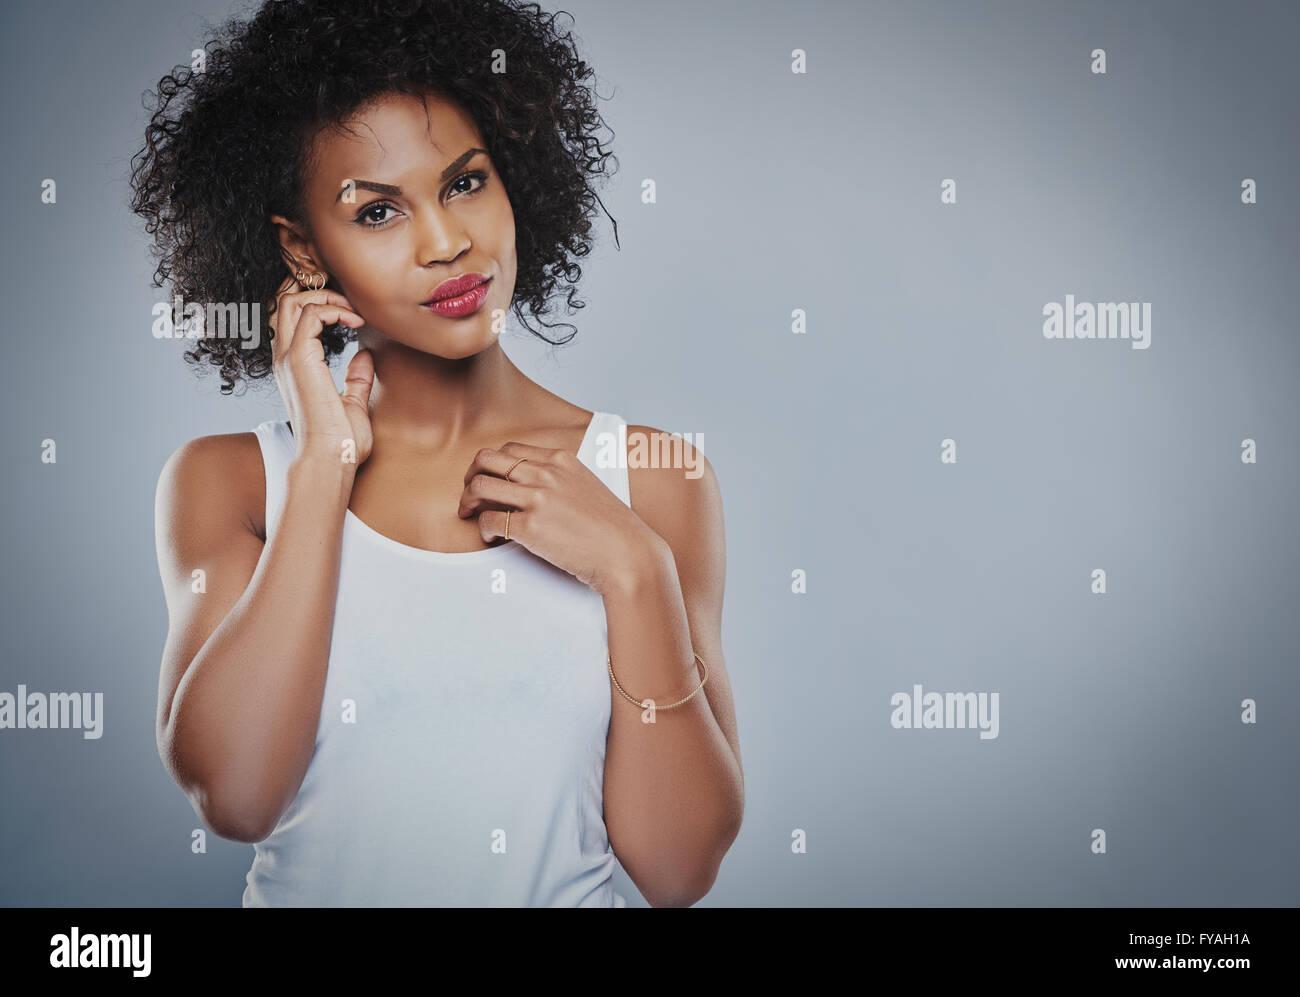 9b823050345502 Schwarzes Unterhemd Stockfotos & Schwarzes Unterhemd Bilder - Alamy